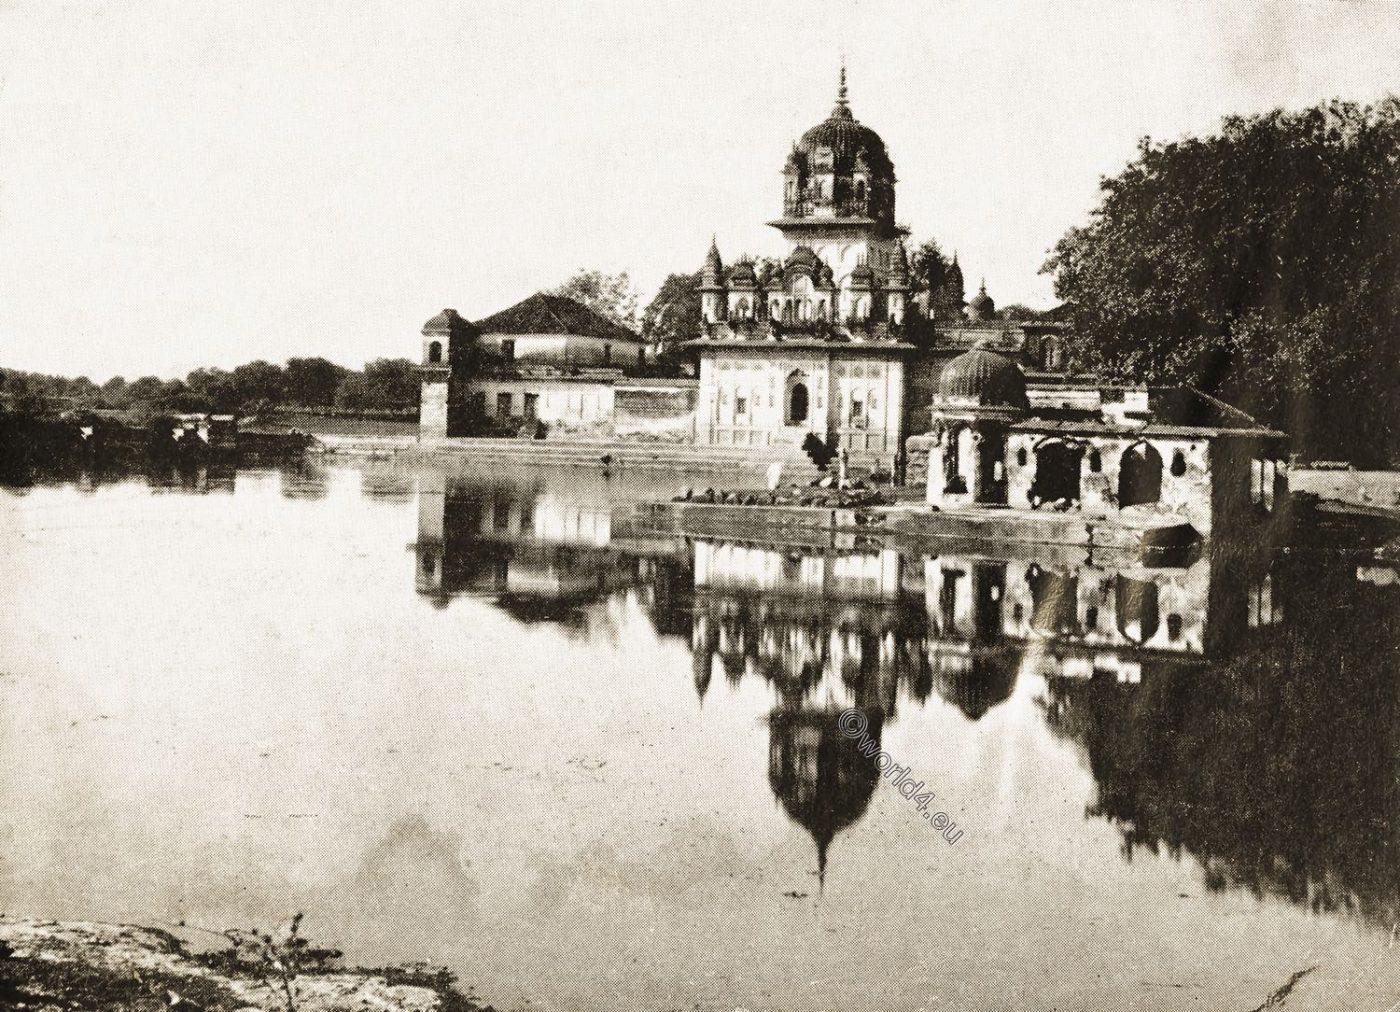 Temple, Jhnasi, India